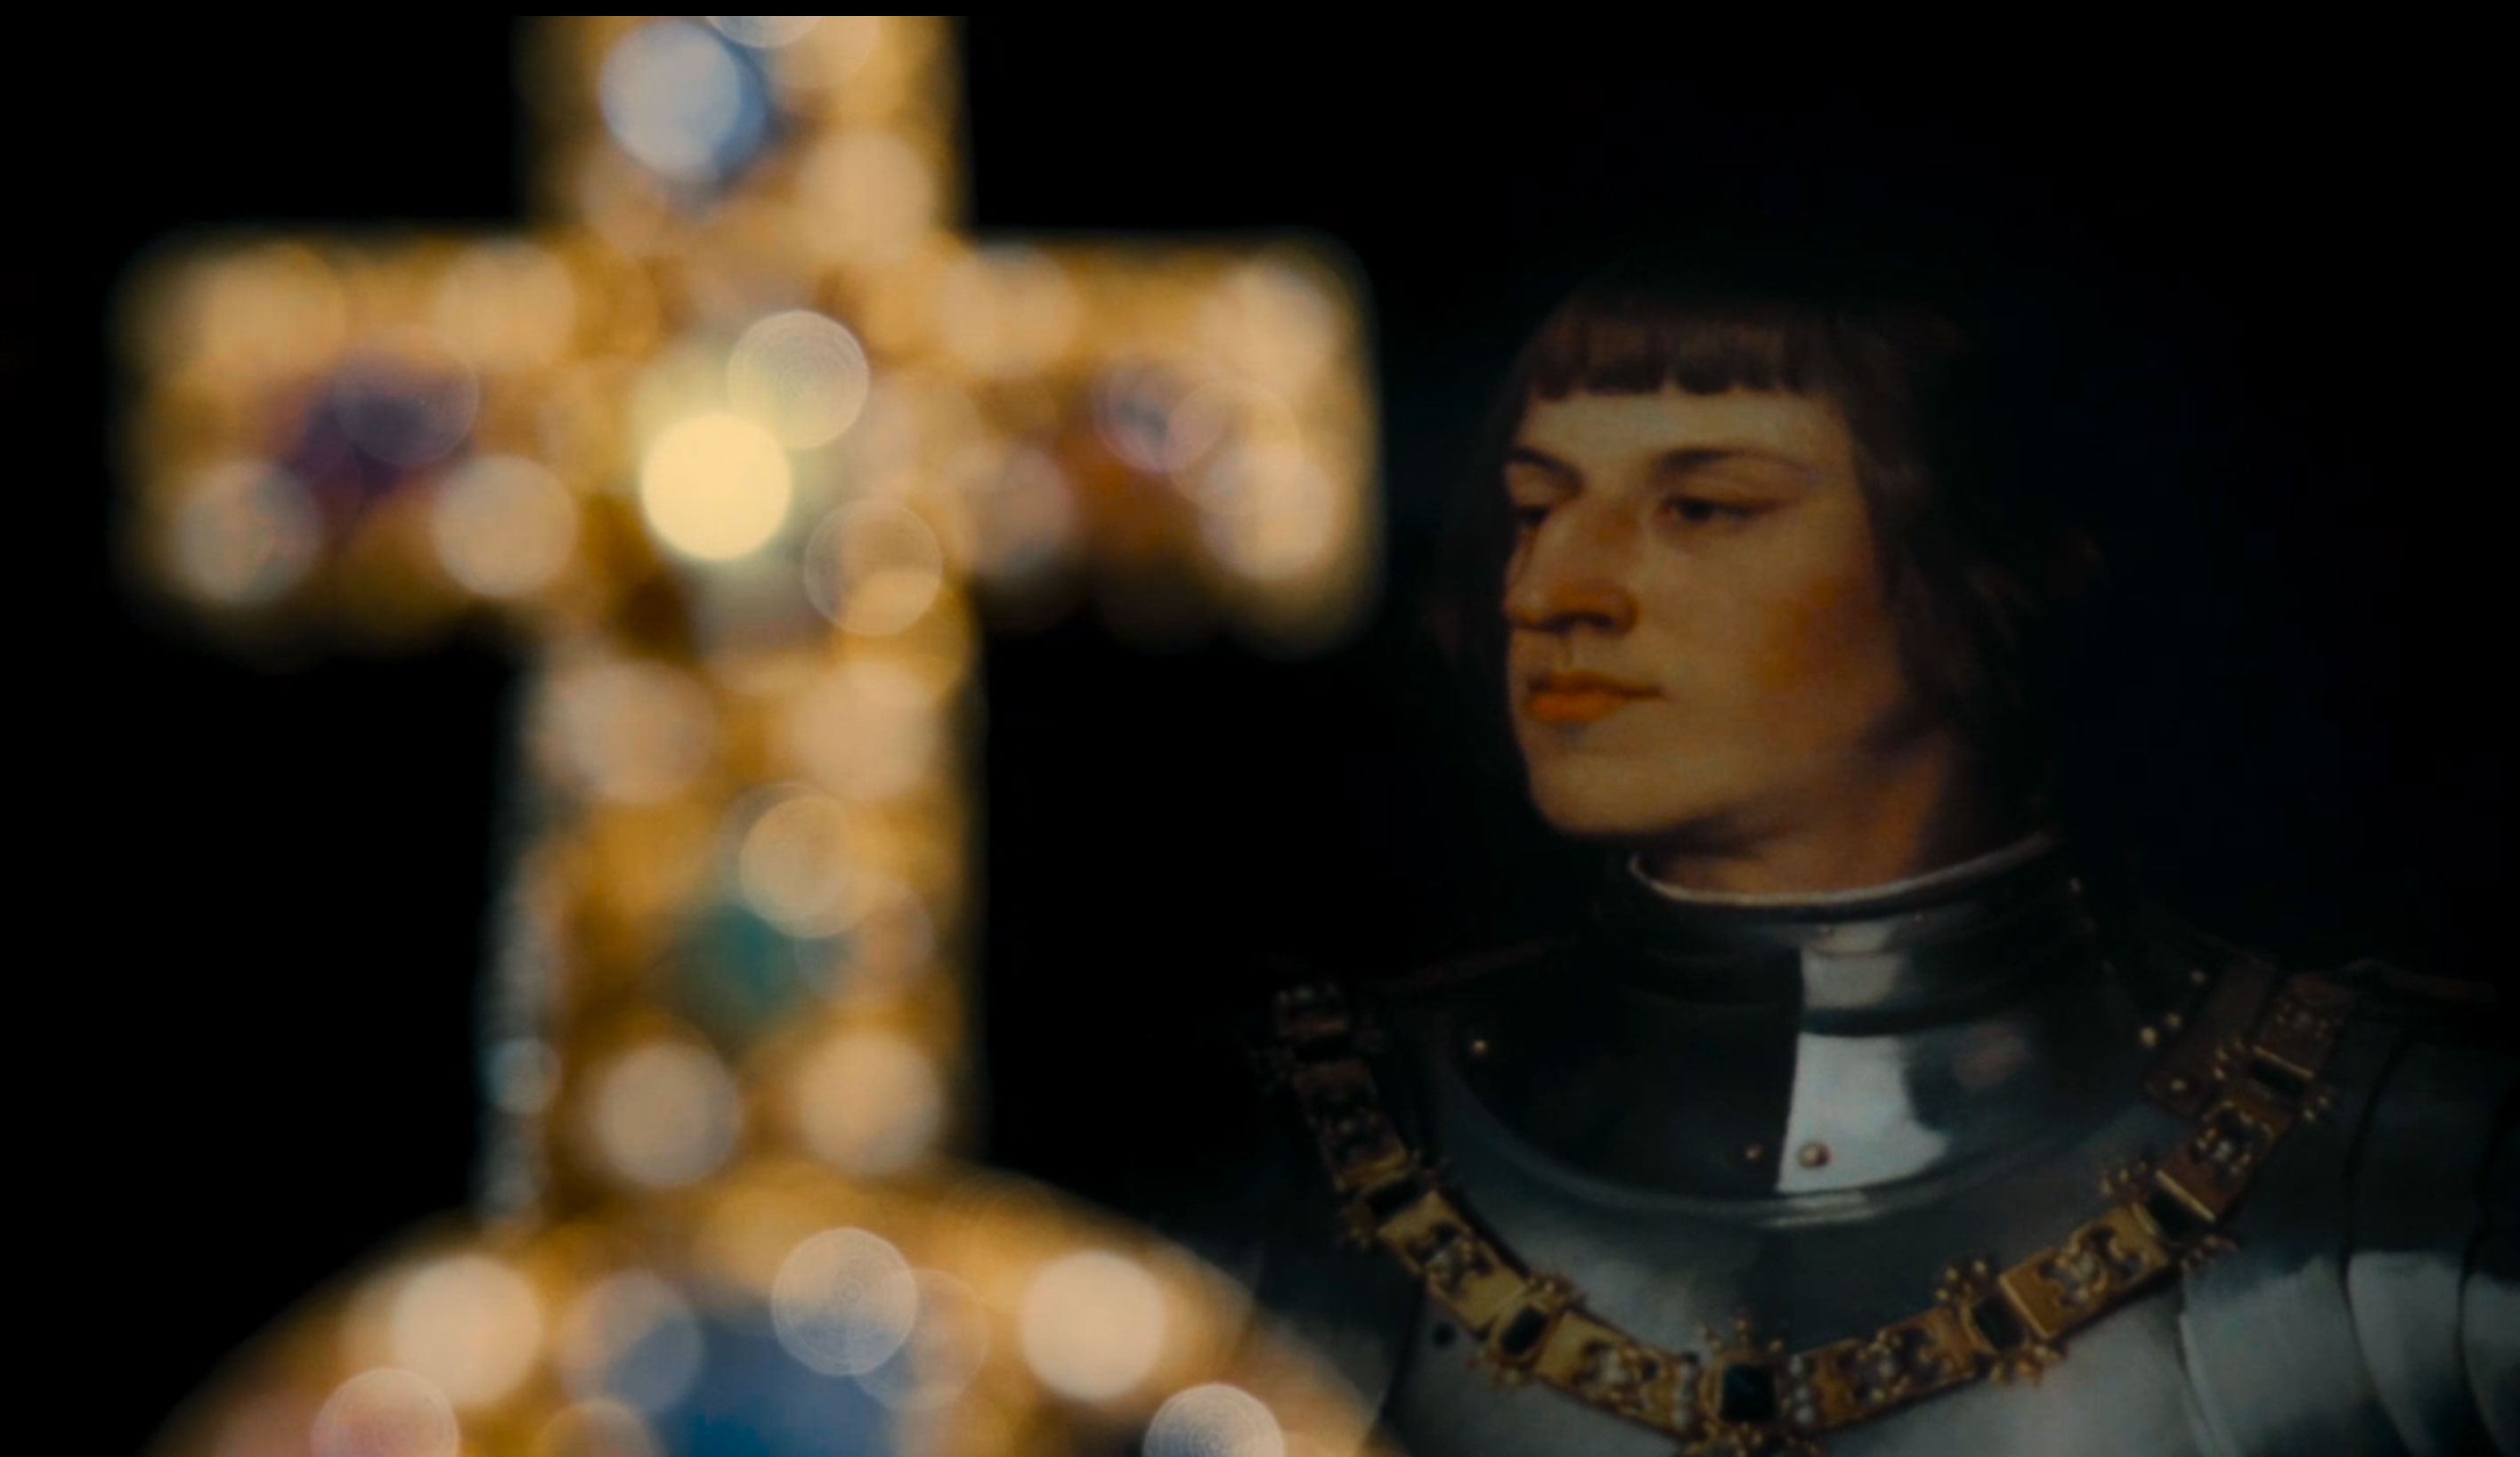 Maximilian - Brautzug zur Macht